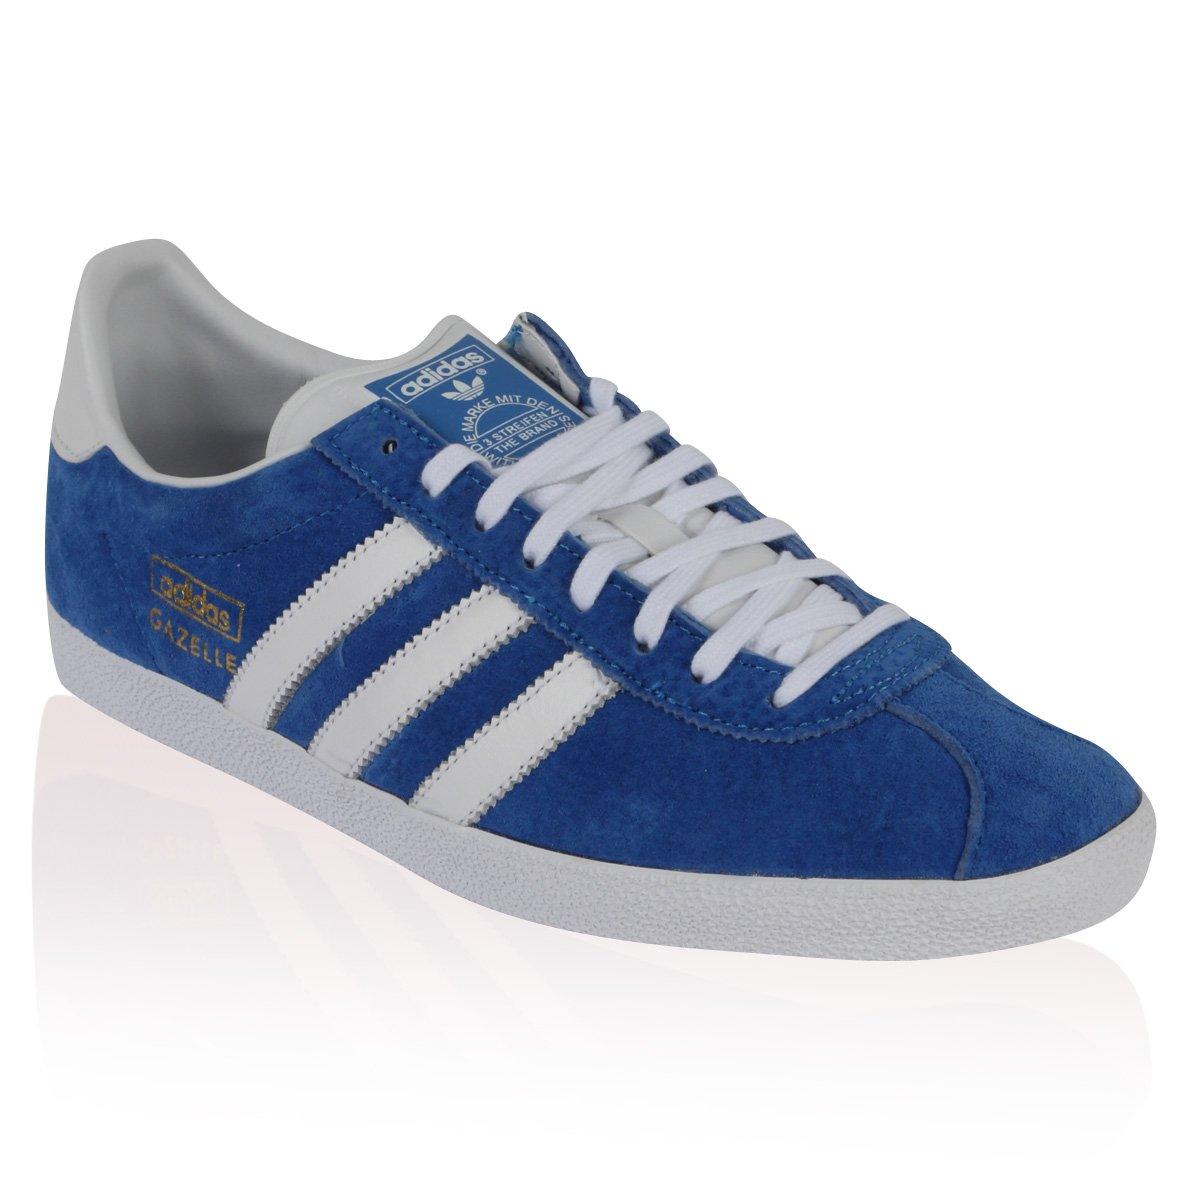 new arrival 8e51b 71dbf adidas Mens Blue Suede Gazelle Originals Retro Lace Up Trainers Shoes Size  11 Amazon.co.uk Shoes  Bags